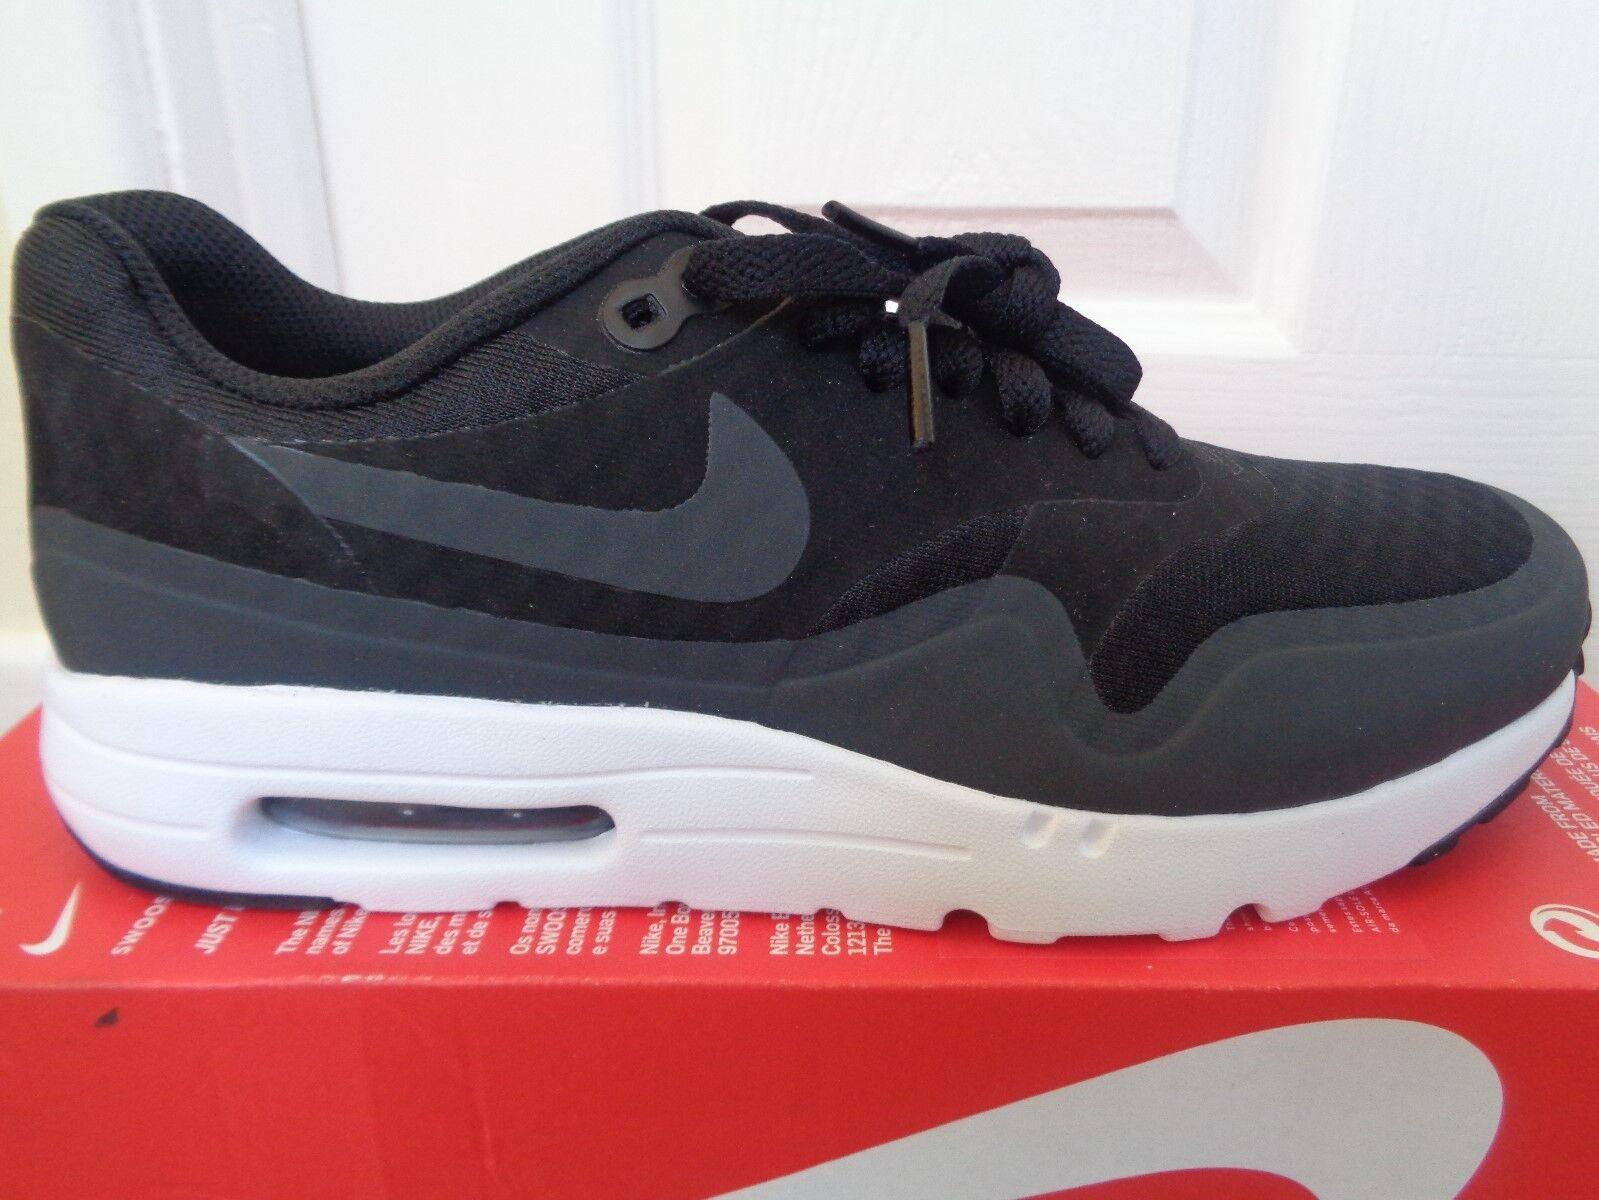 new arrival e2ce9 b4606 Nike Air Max 1 trainers 819476 004 uk 6 eu 40 us 7 NEW+BOX Ultra Essential  nqtner2180-Sneaker